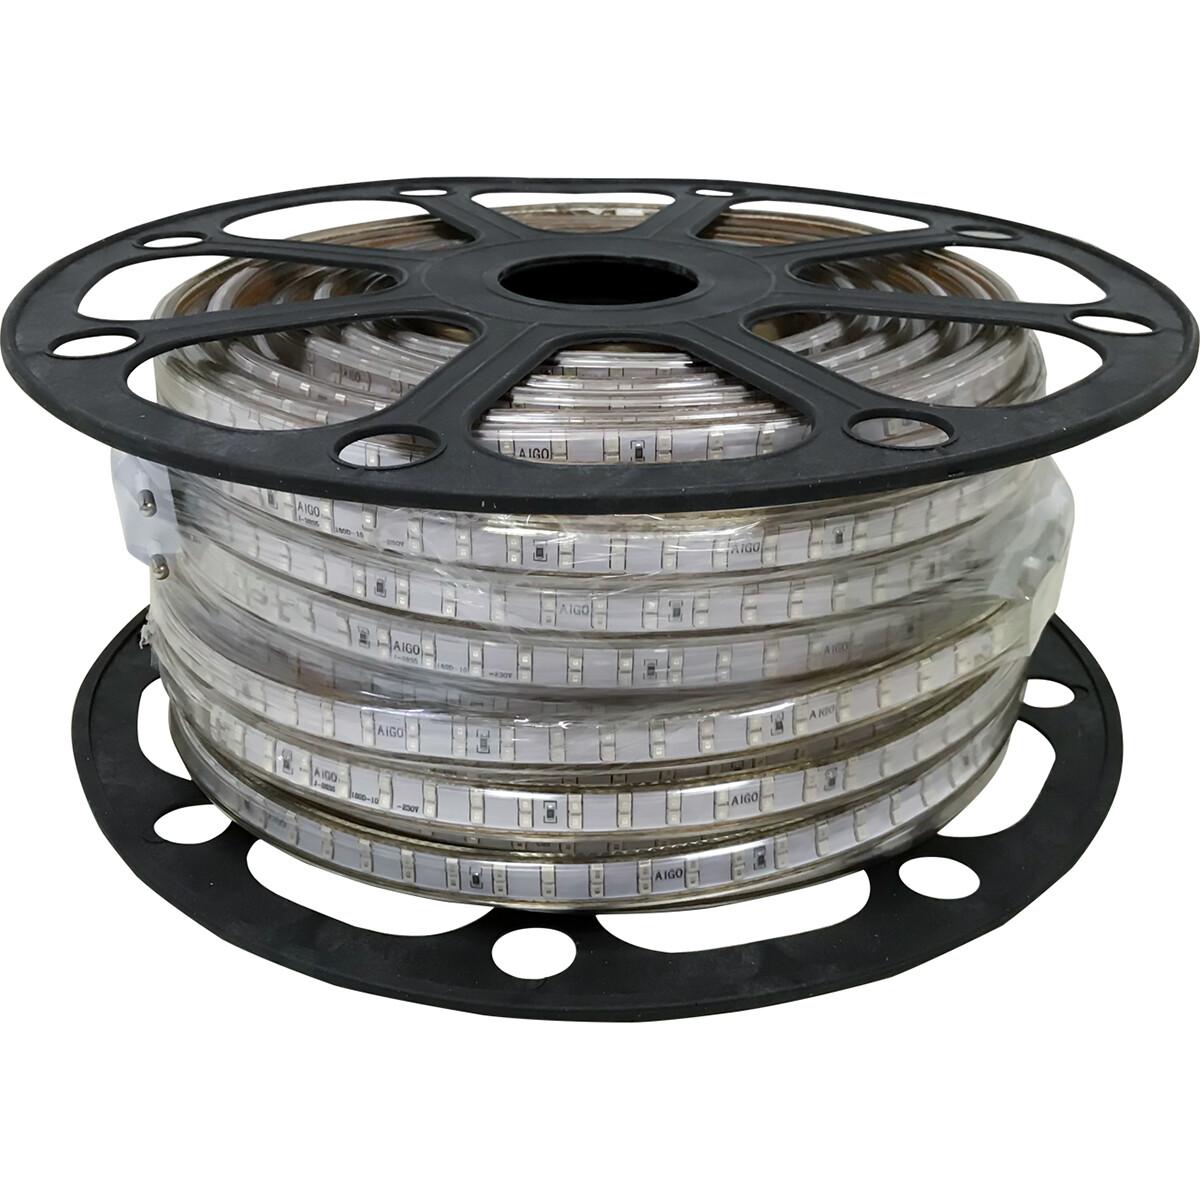 LED Strip - Aigi Strobi - 50 Meter - Dimbaar - IP65 Waterdicht - Blauw - 2835 SMD 230V